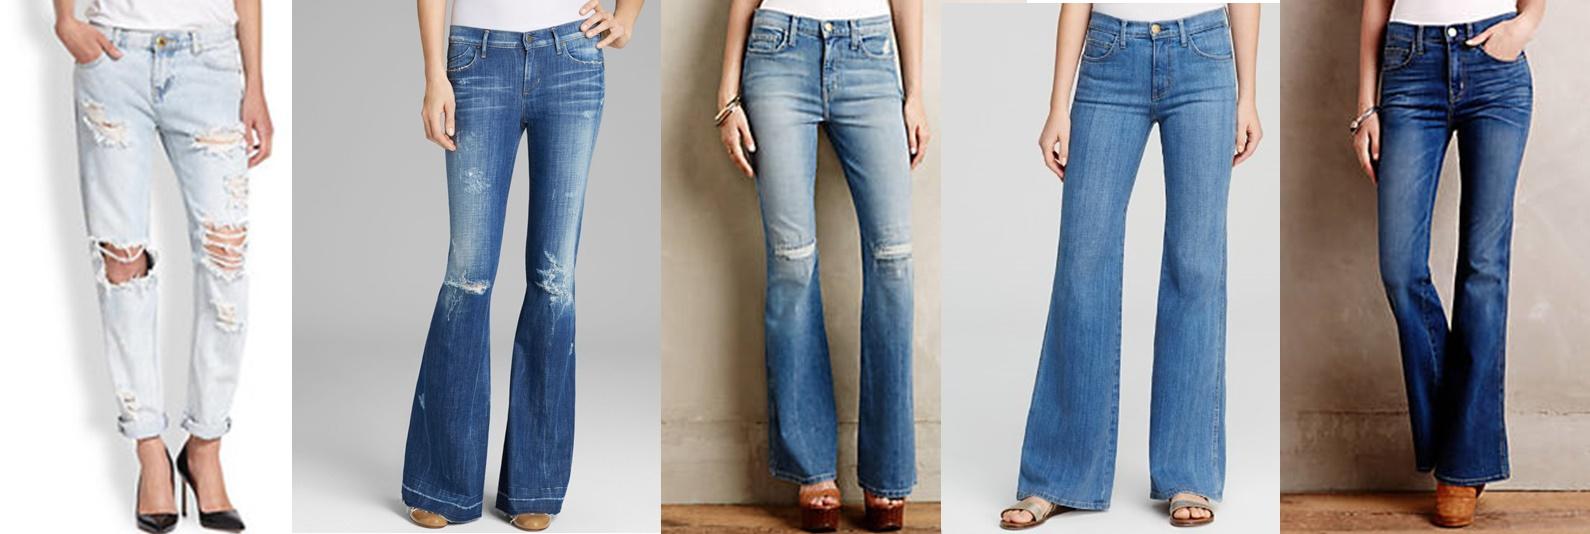 jeans01.jpg